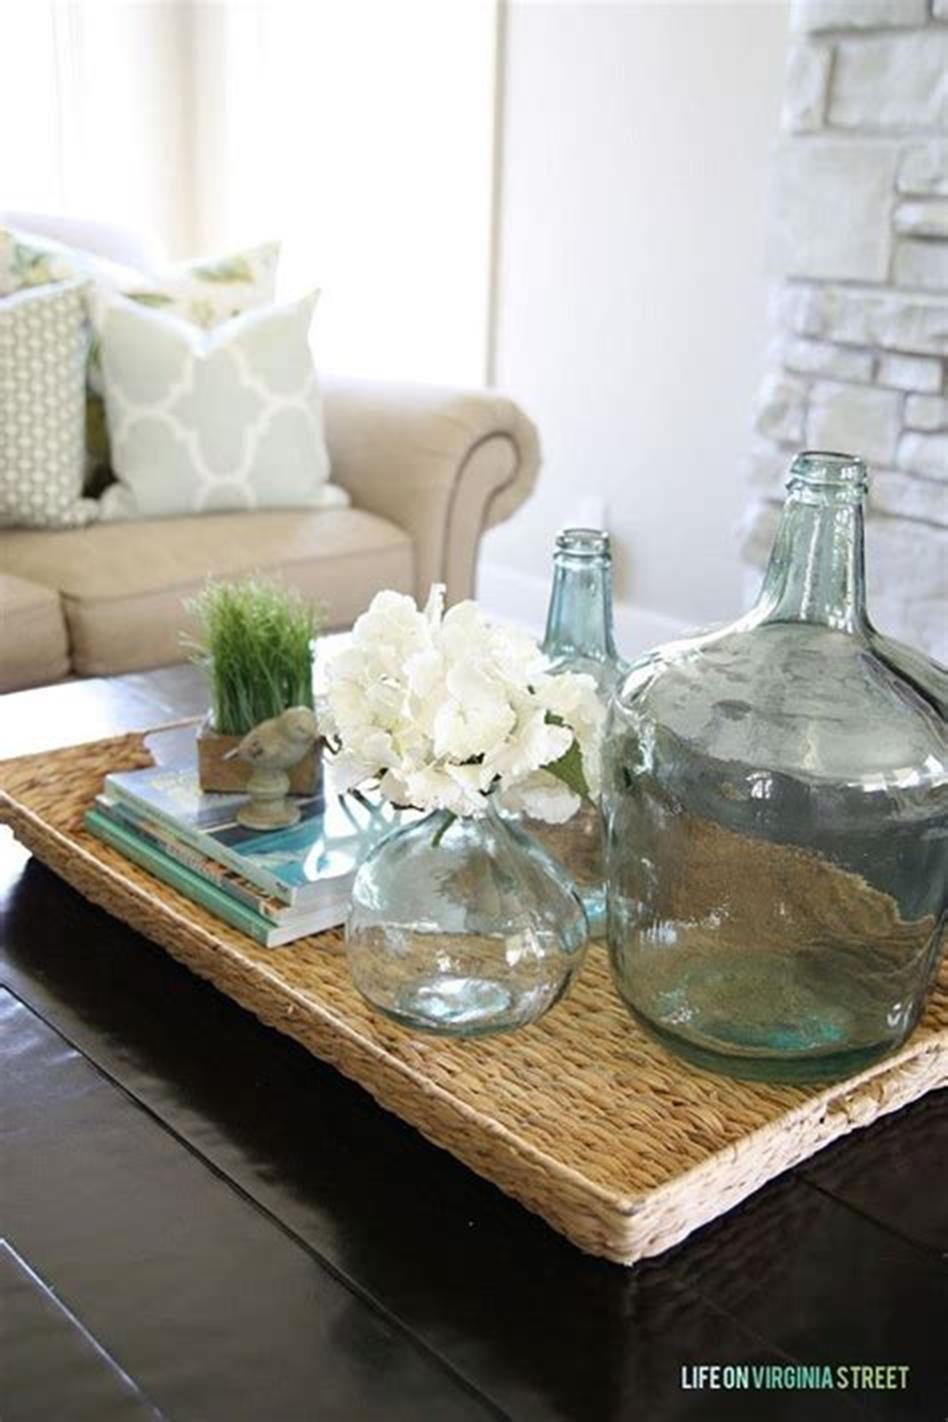 46 Awesome Coffee Table Tray Decor Ideas 11 Coffee Table Decor Tray Coffee Table Living Room Modern Coffee Table Decor Living Room [ 1422 x 948 Pixel ]